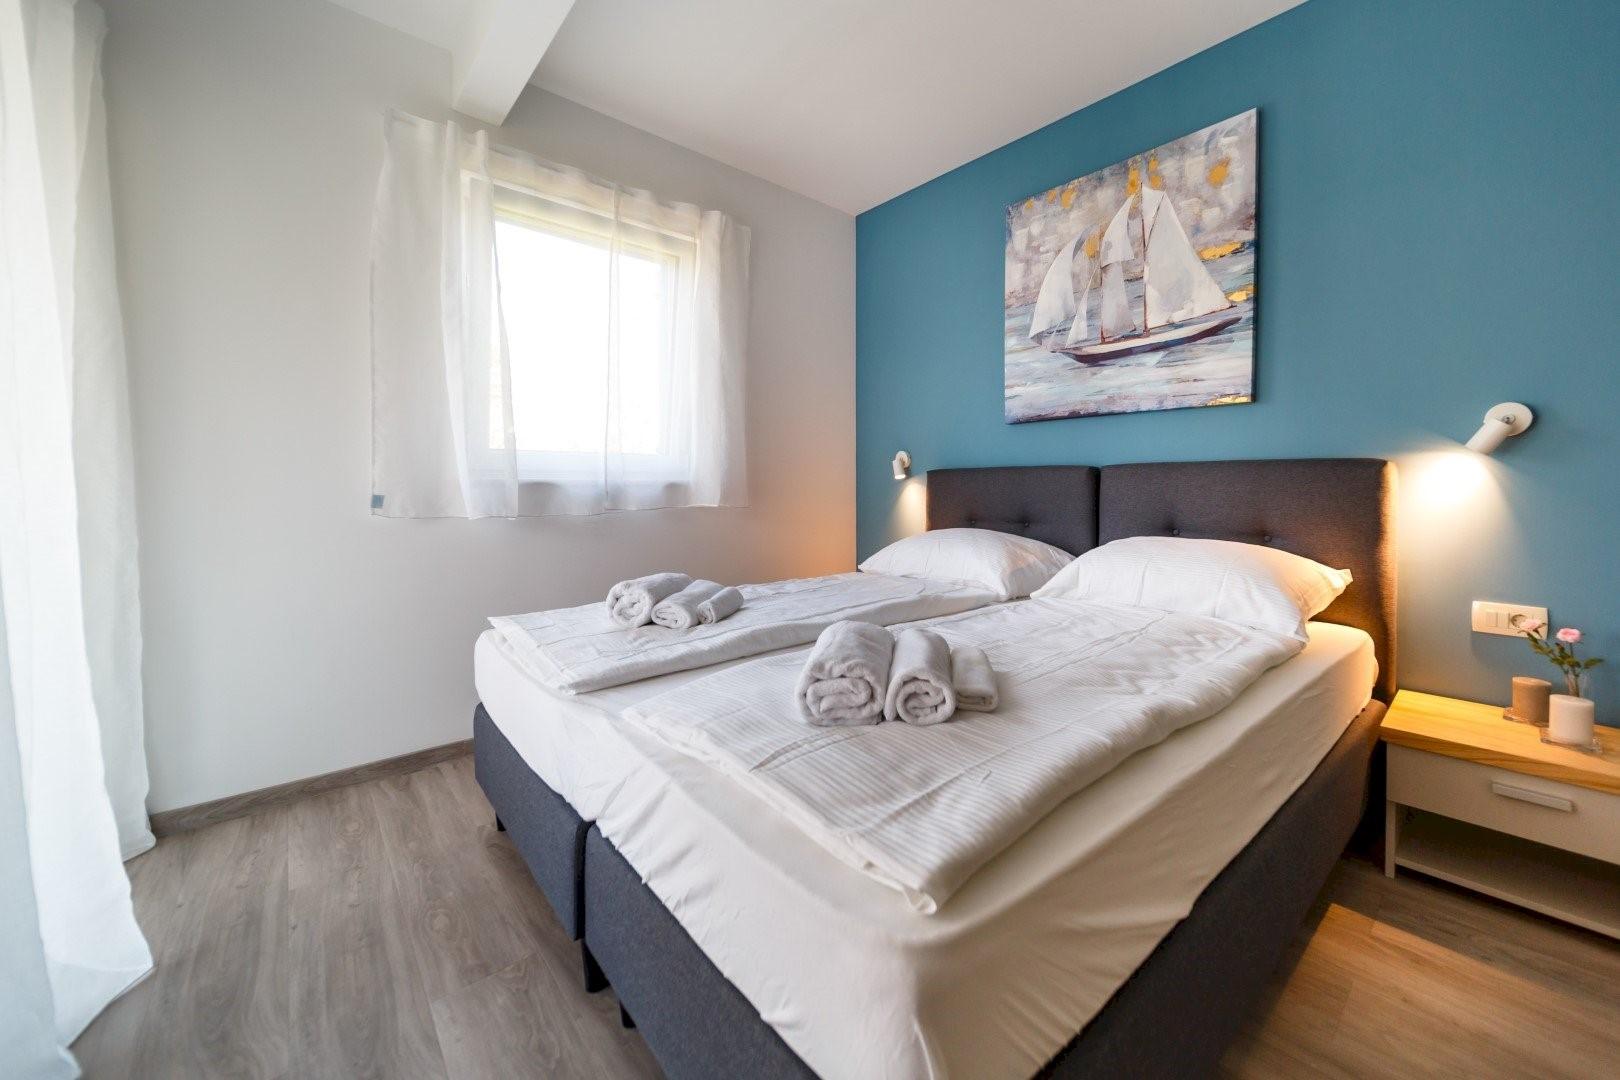 Ferienhaus Luxury Villa Loma 1 (2586644), Sveti Vid-Miholjice, Insel Krk, Kvarner, Kroatien, Bild 15